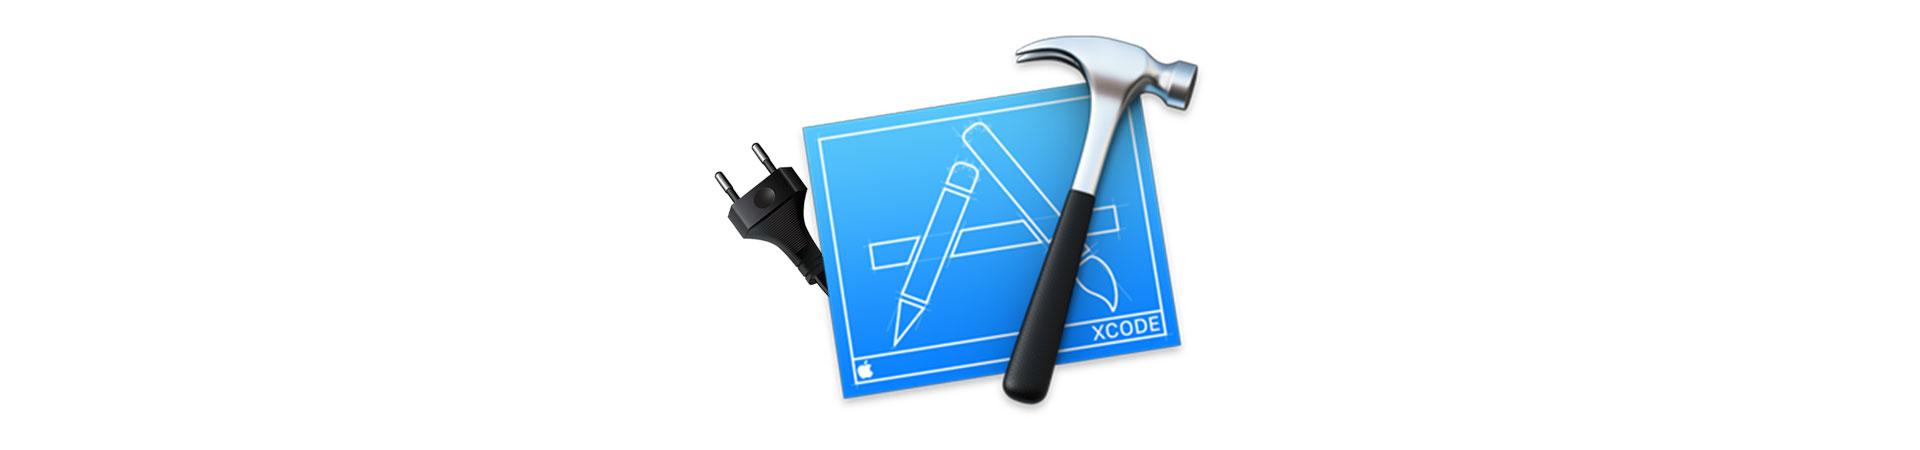 xcode_plugins